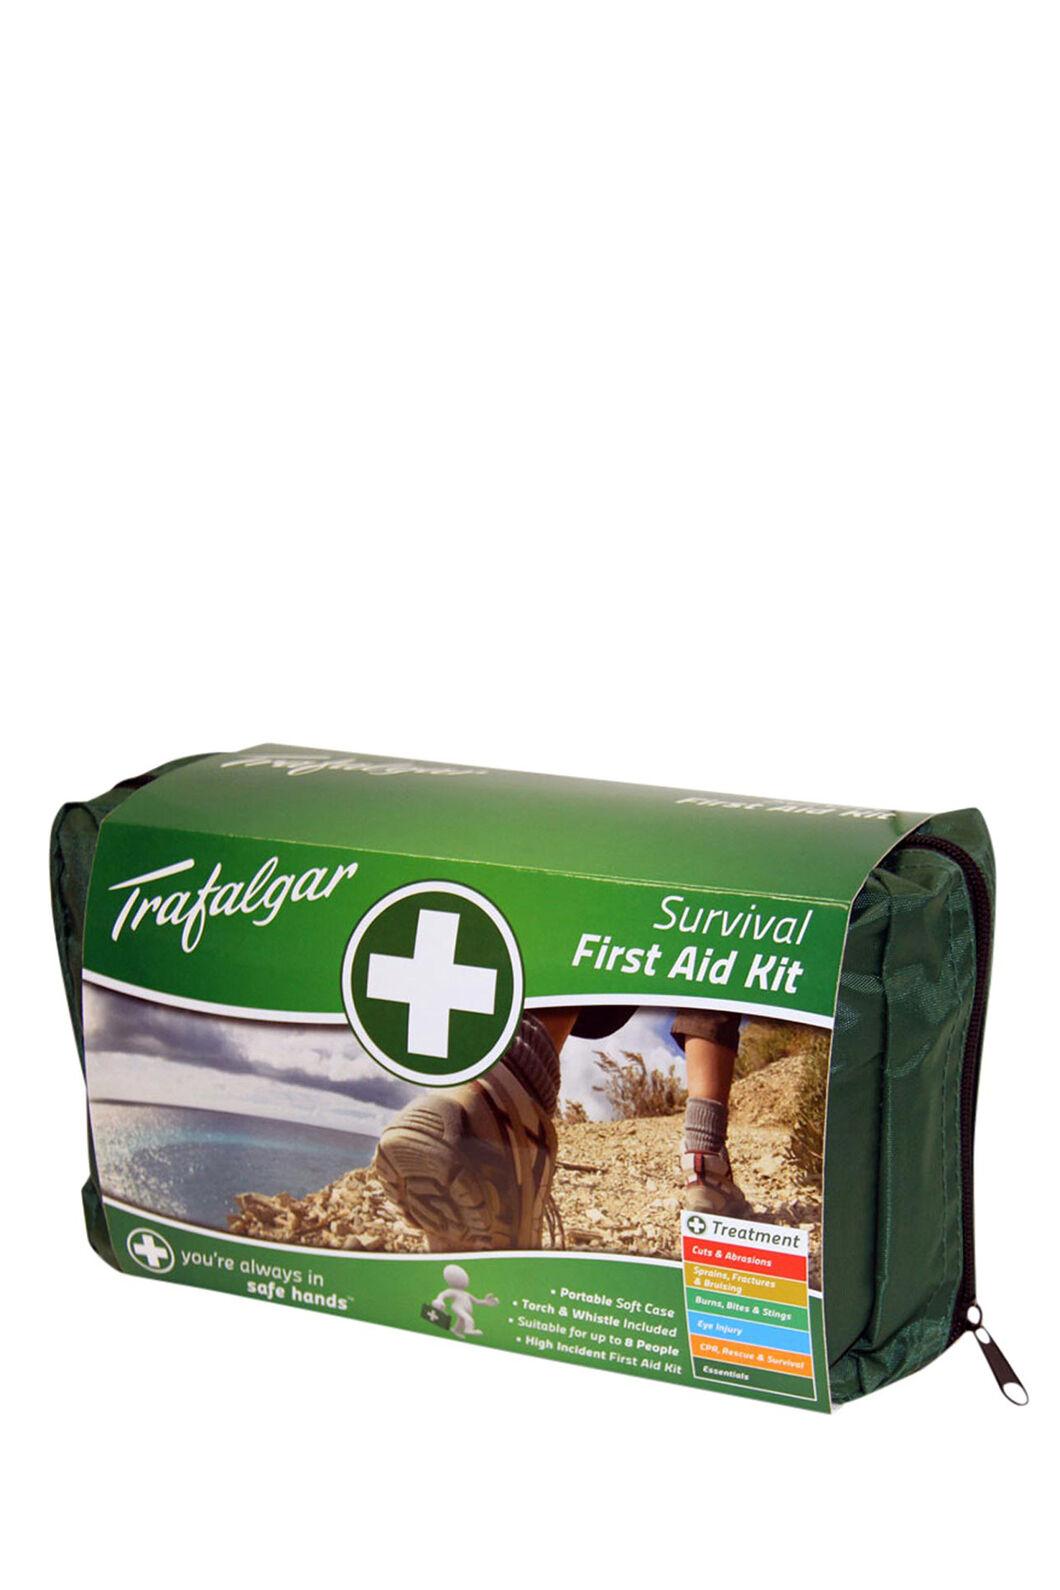 Trafalgar Survival First Aid Kit, None, hi-res